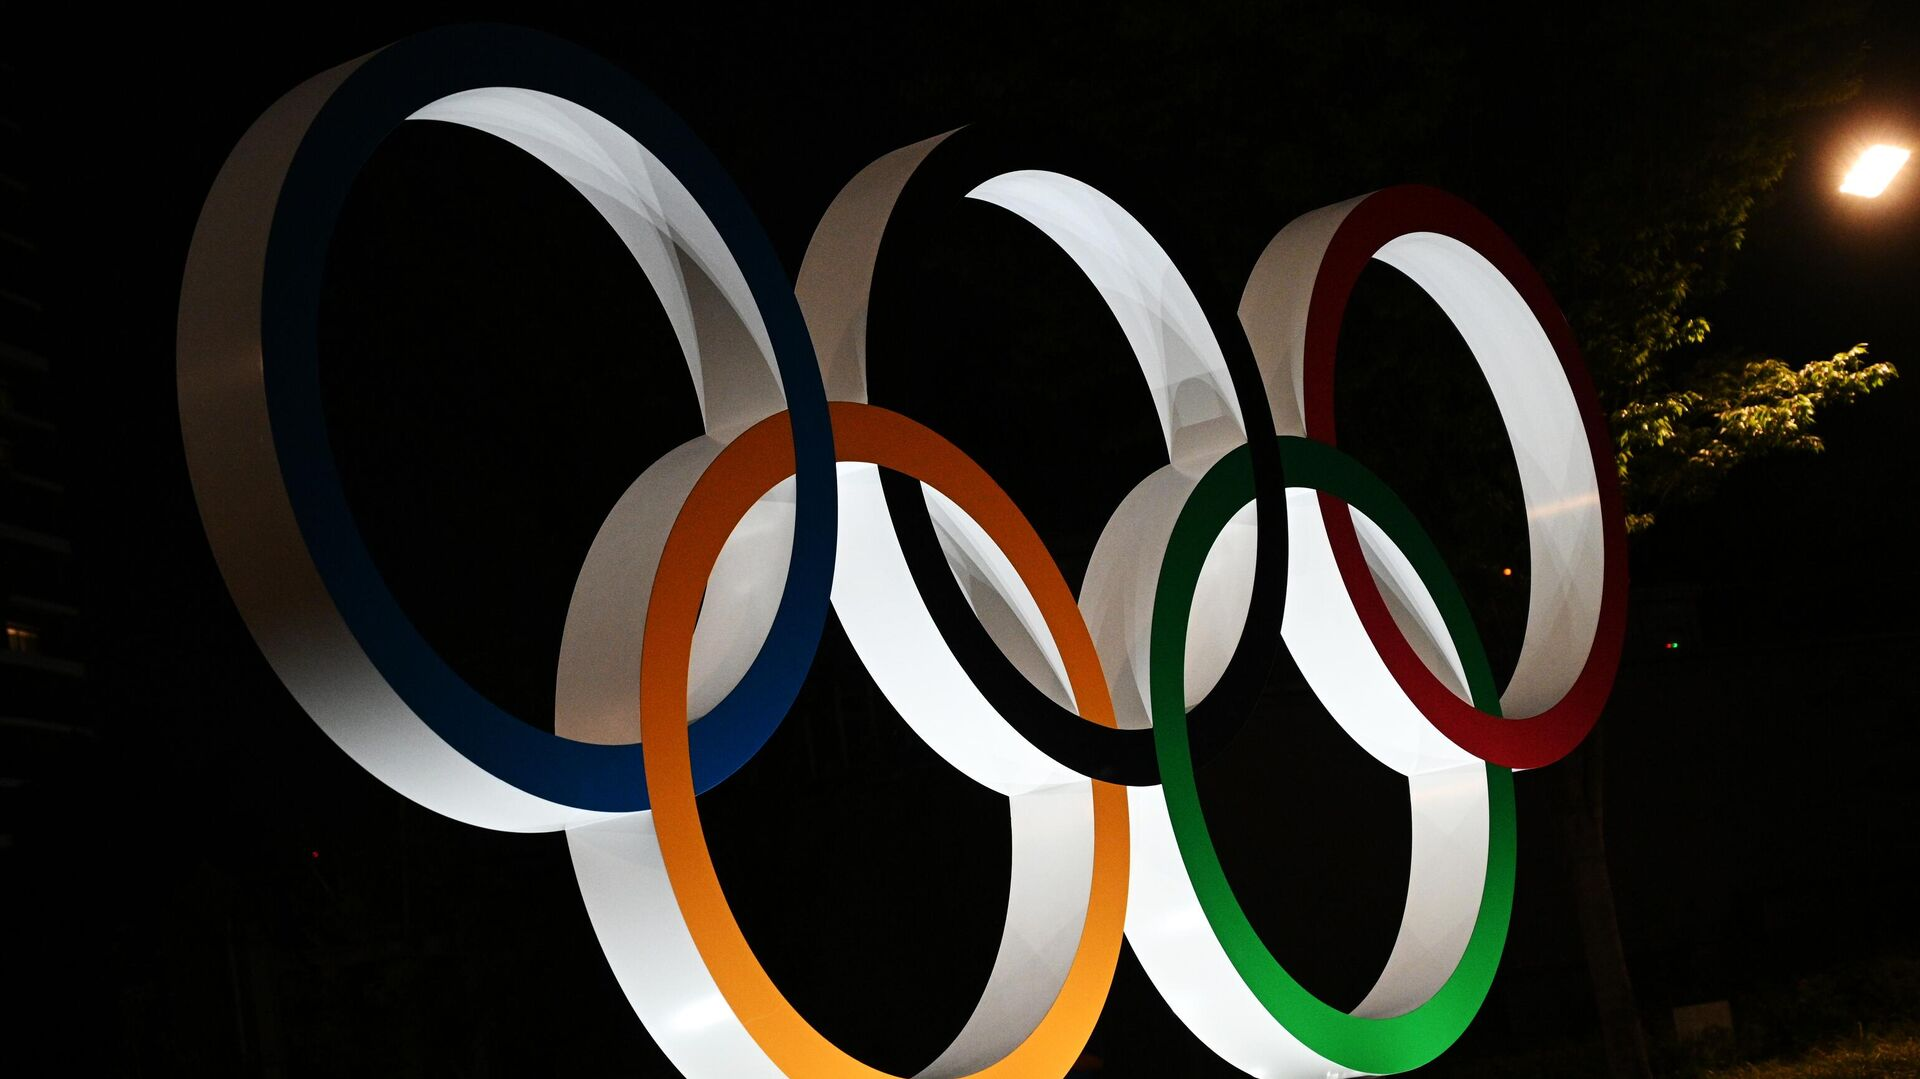 Токио накануне открытия Олимпийских игр - РИА Новости, 1920, 25.07.2021